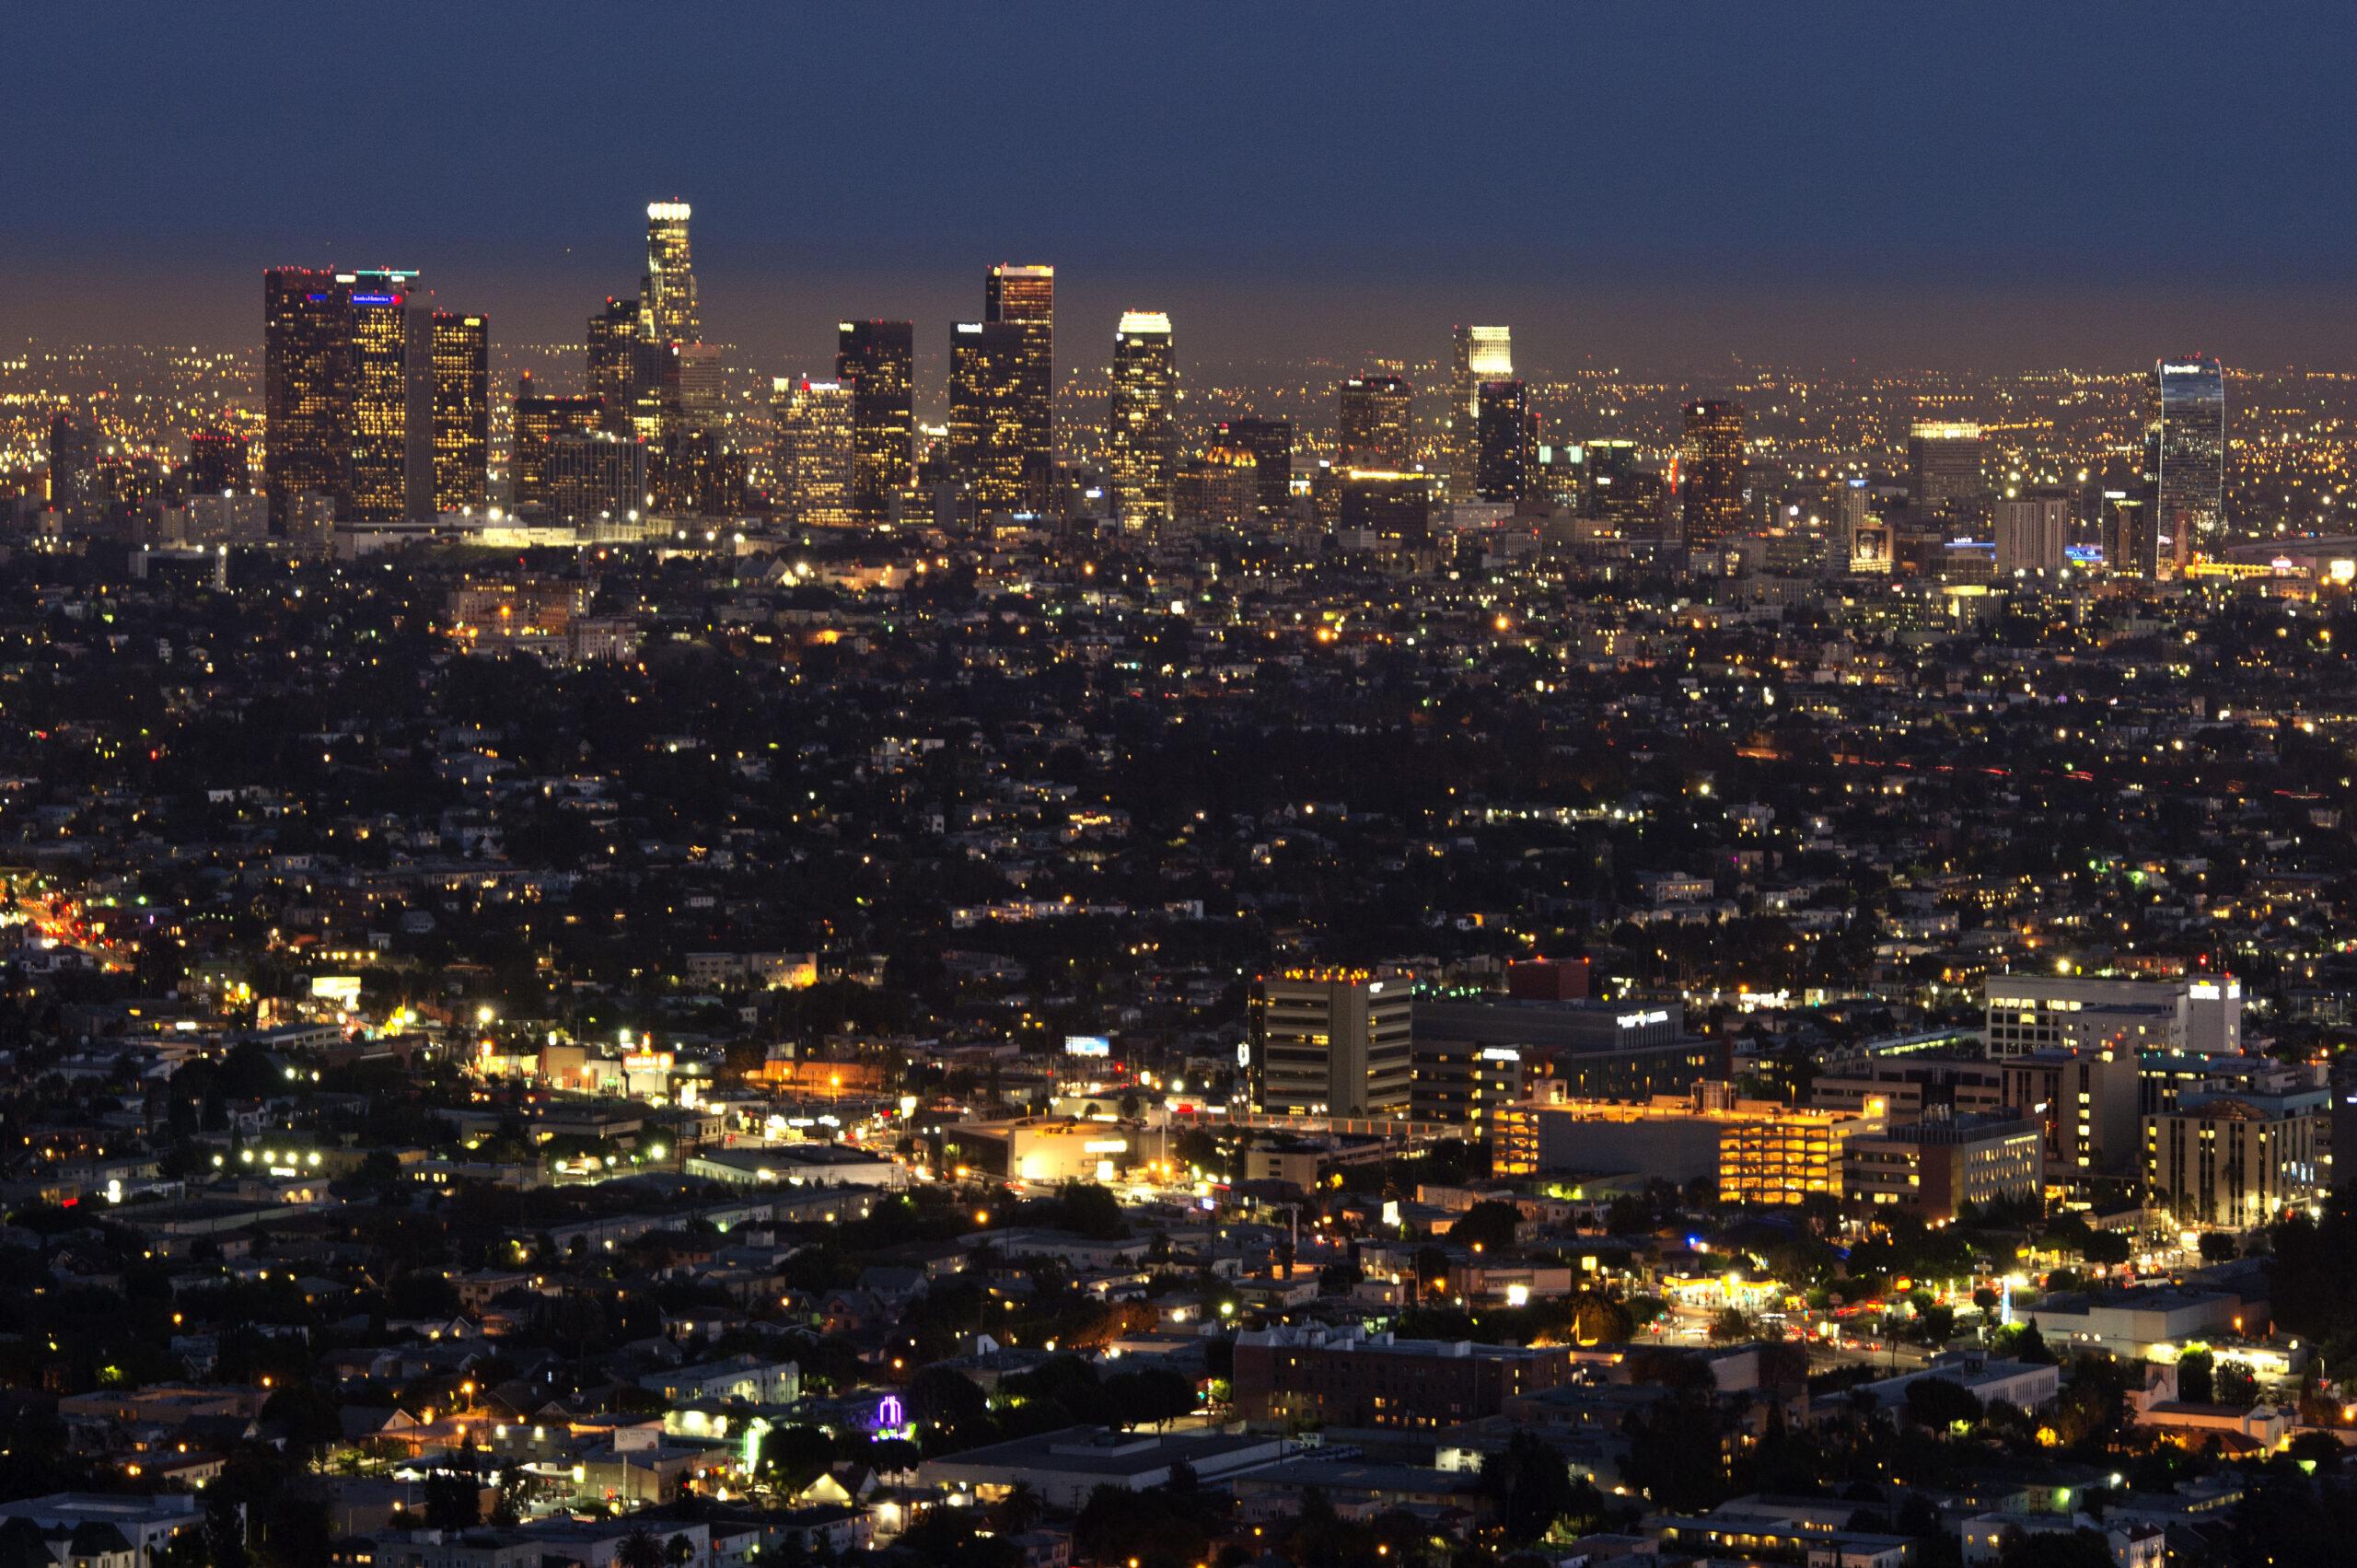 The Los Angeles skyline is seen during twilight on Aug. 21, 2013 in California. Credit: Joe Klamar/AFP via Getty Images